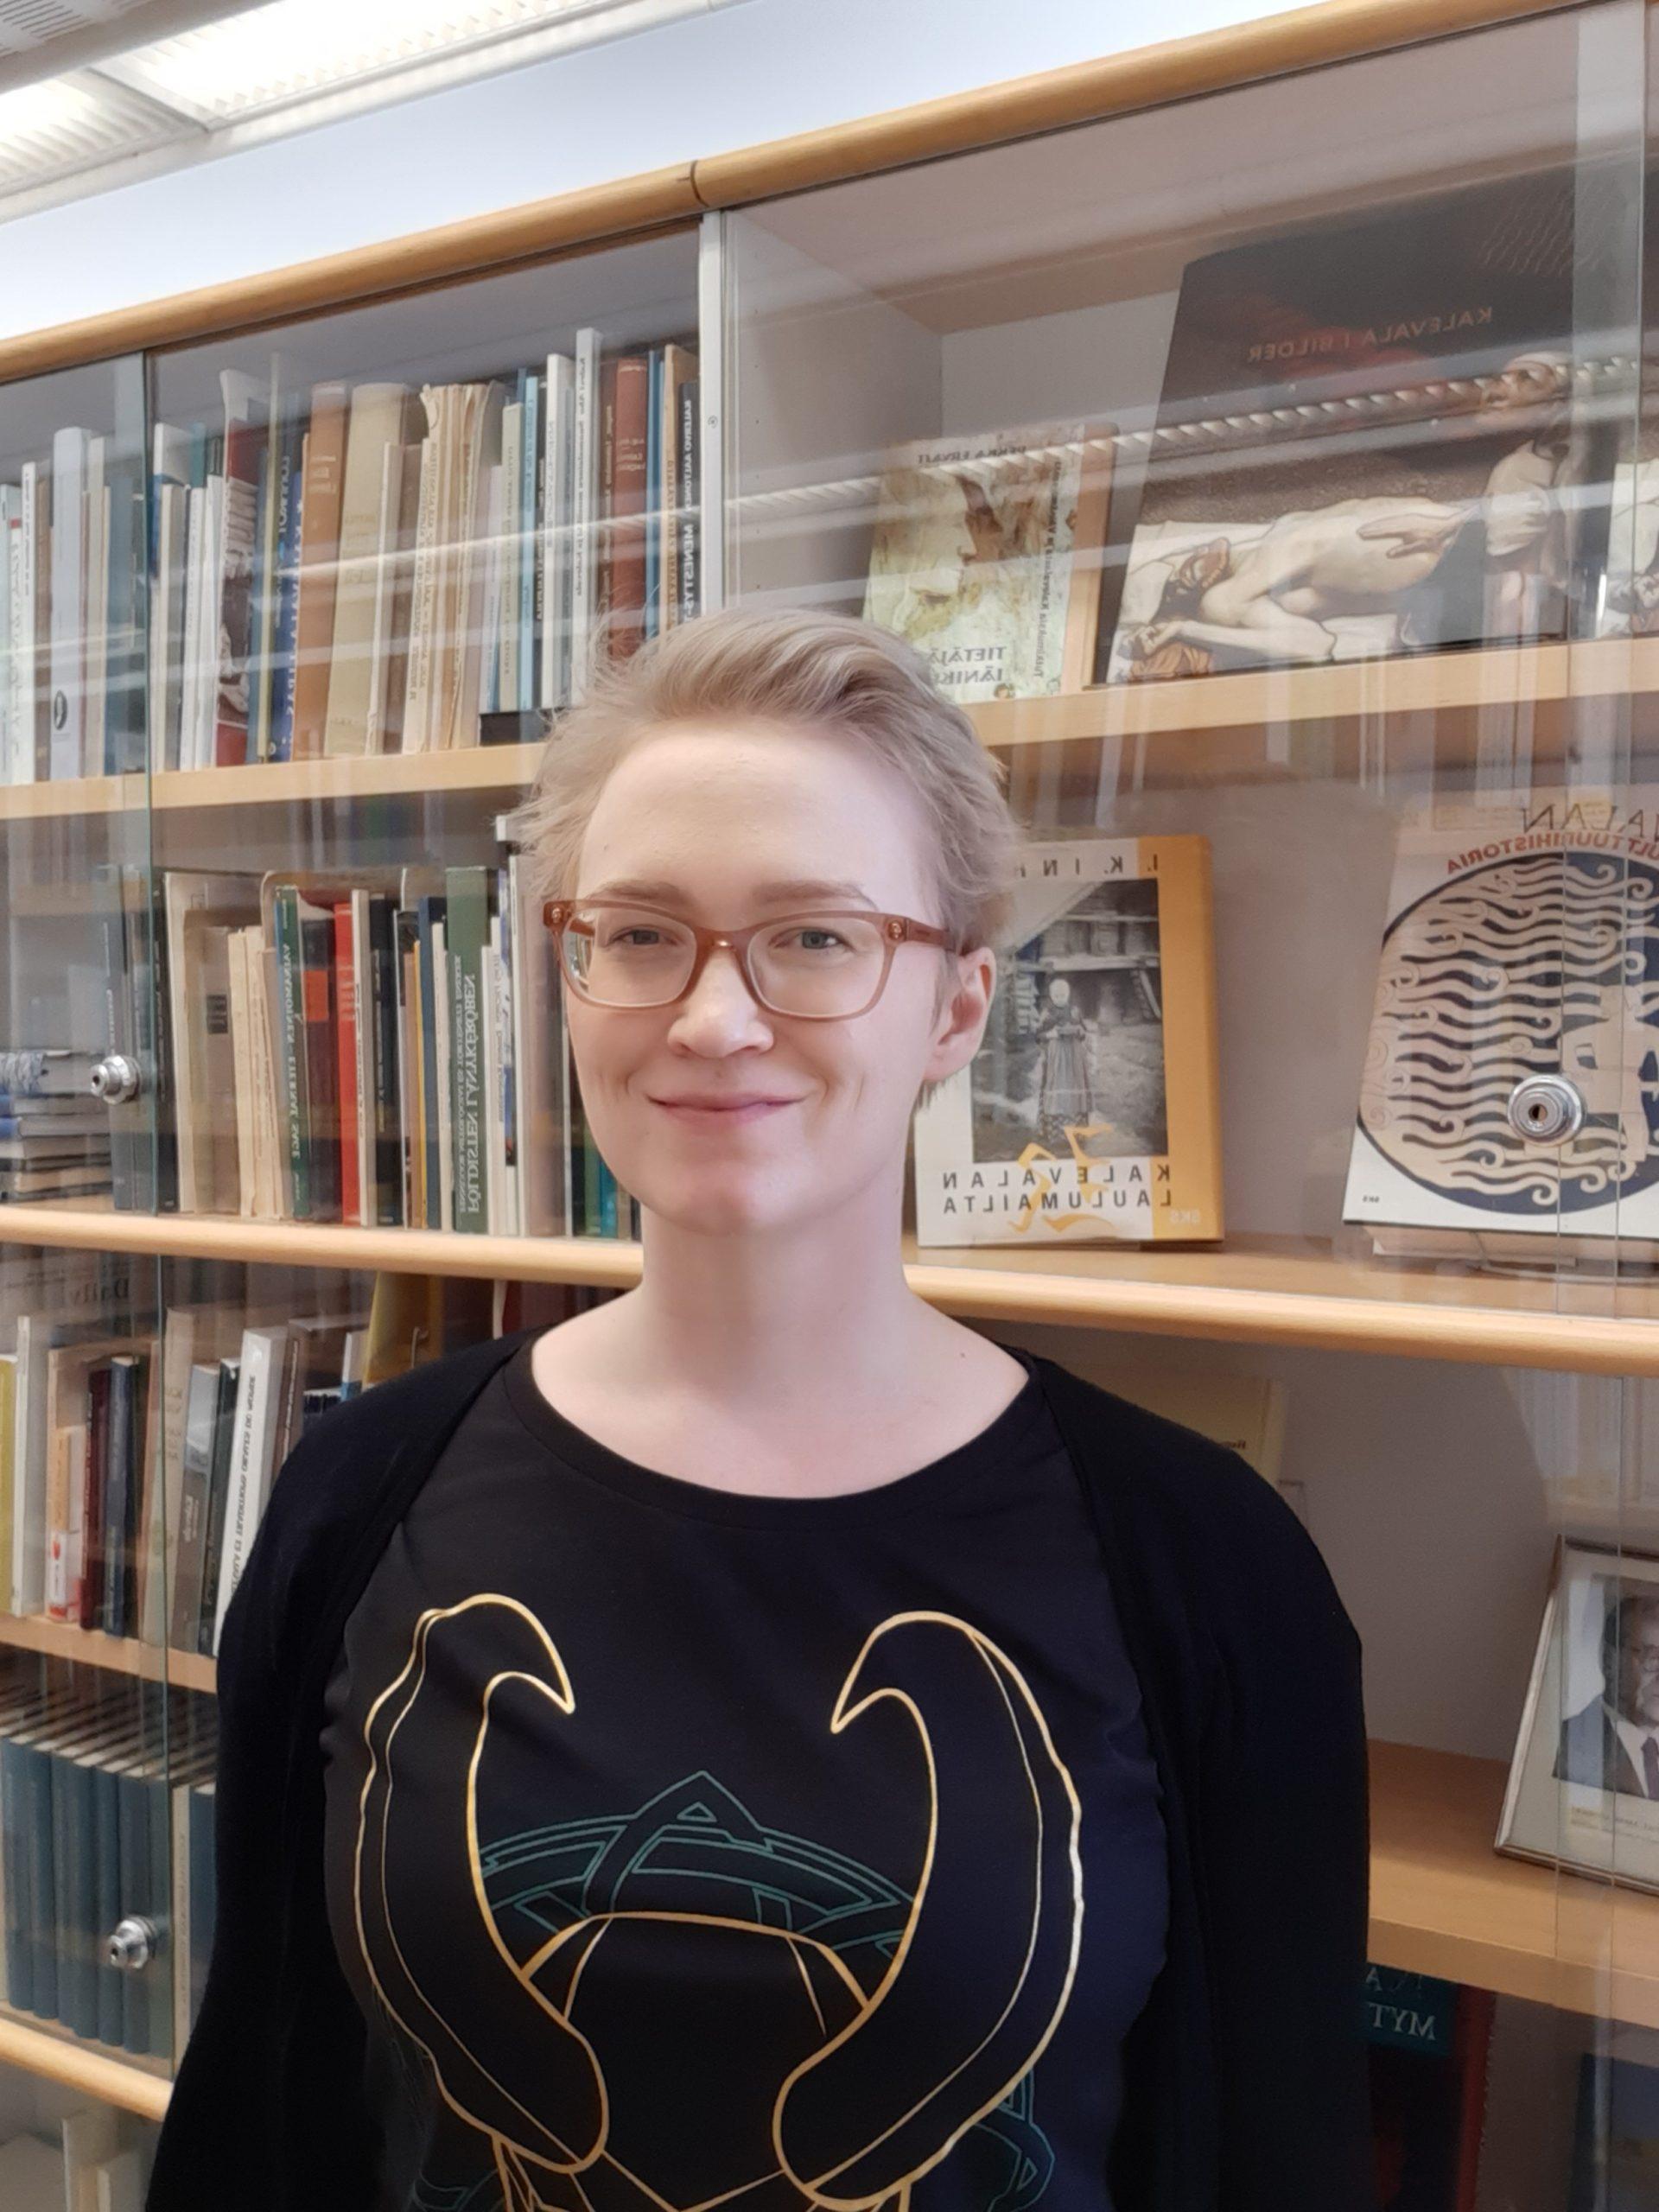 Hanna kirjahyllyn edessä. Hanna in front of a book shelf.